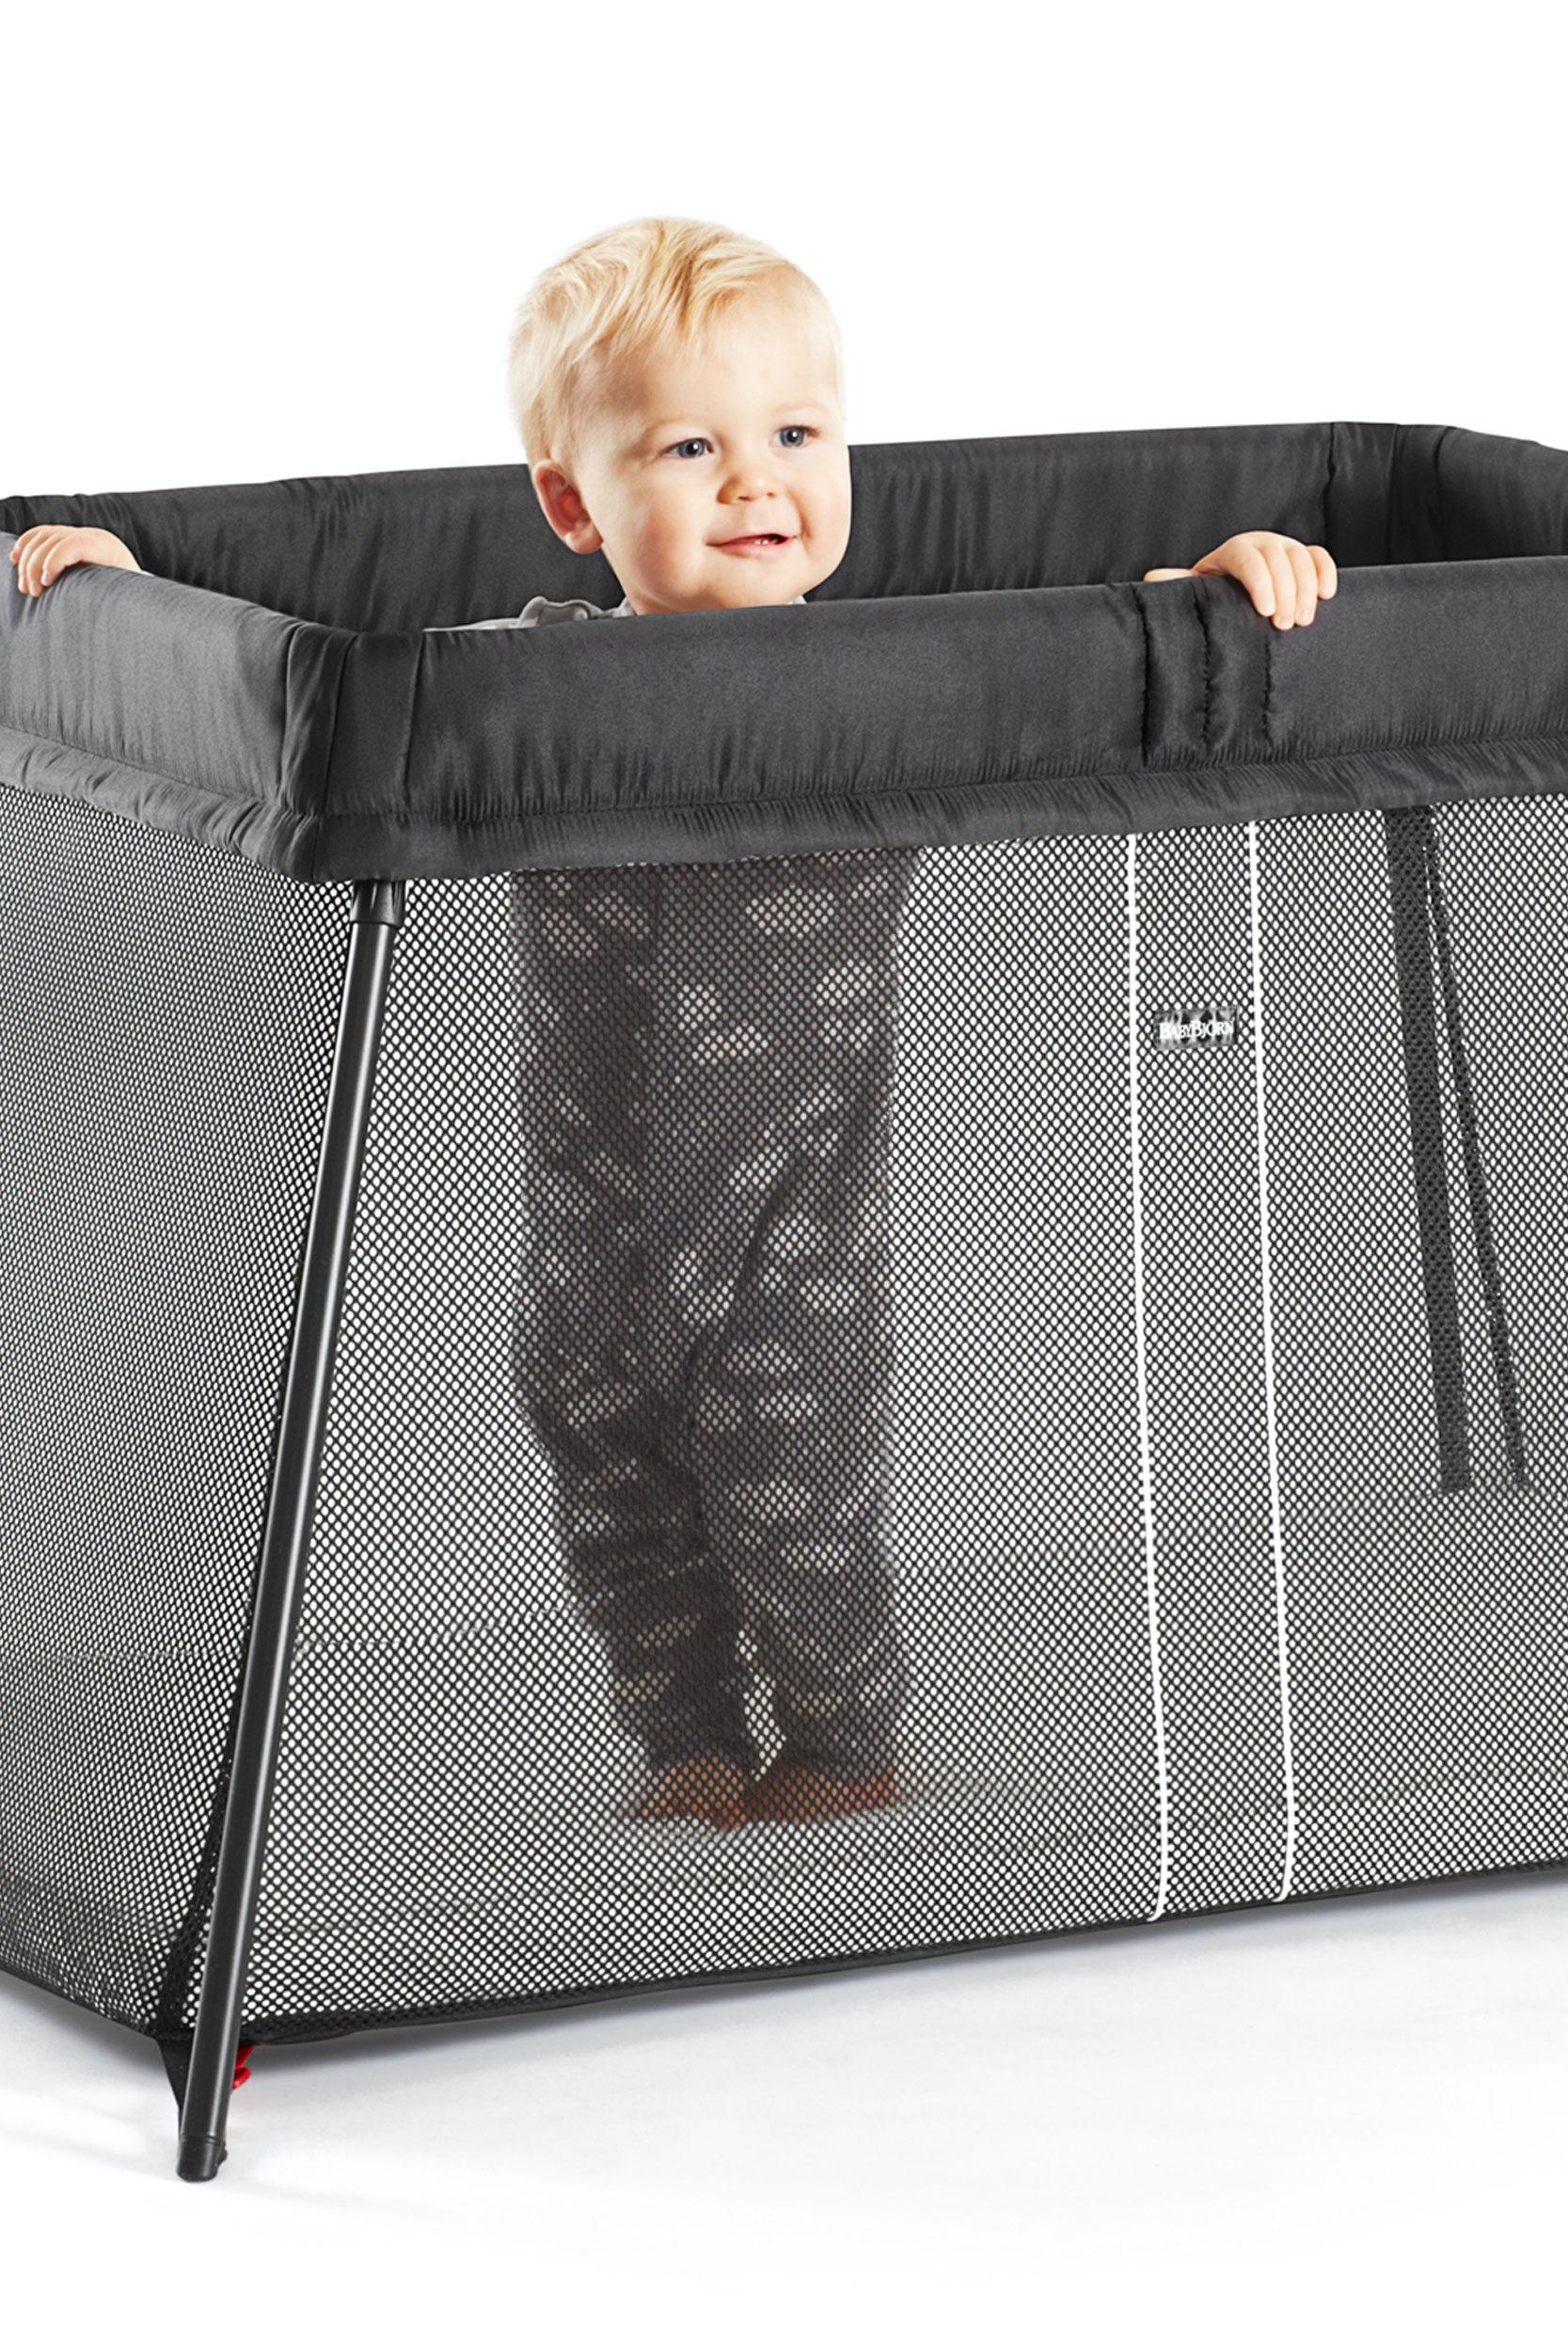 Babybjorn Lit Parapluie Light.Travel Crib Light Perfect At Home Away Babybjorn